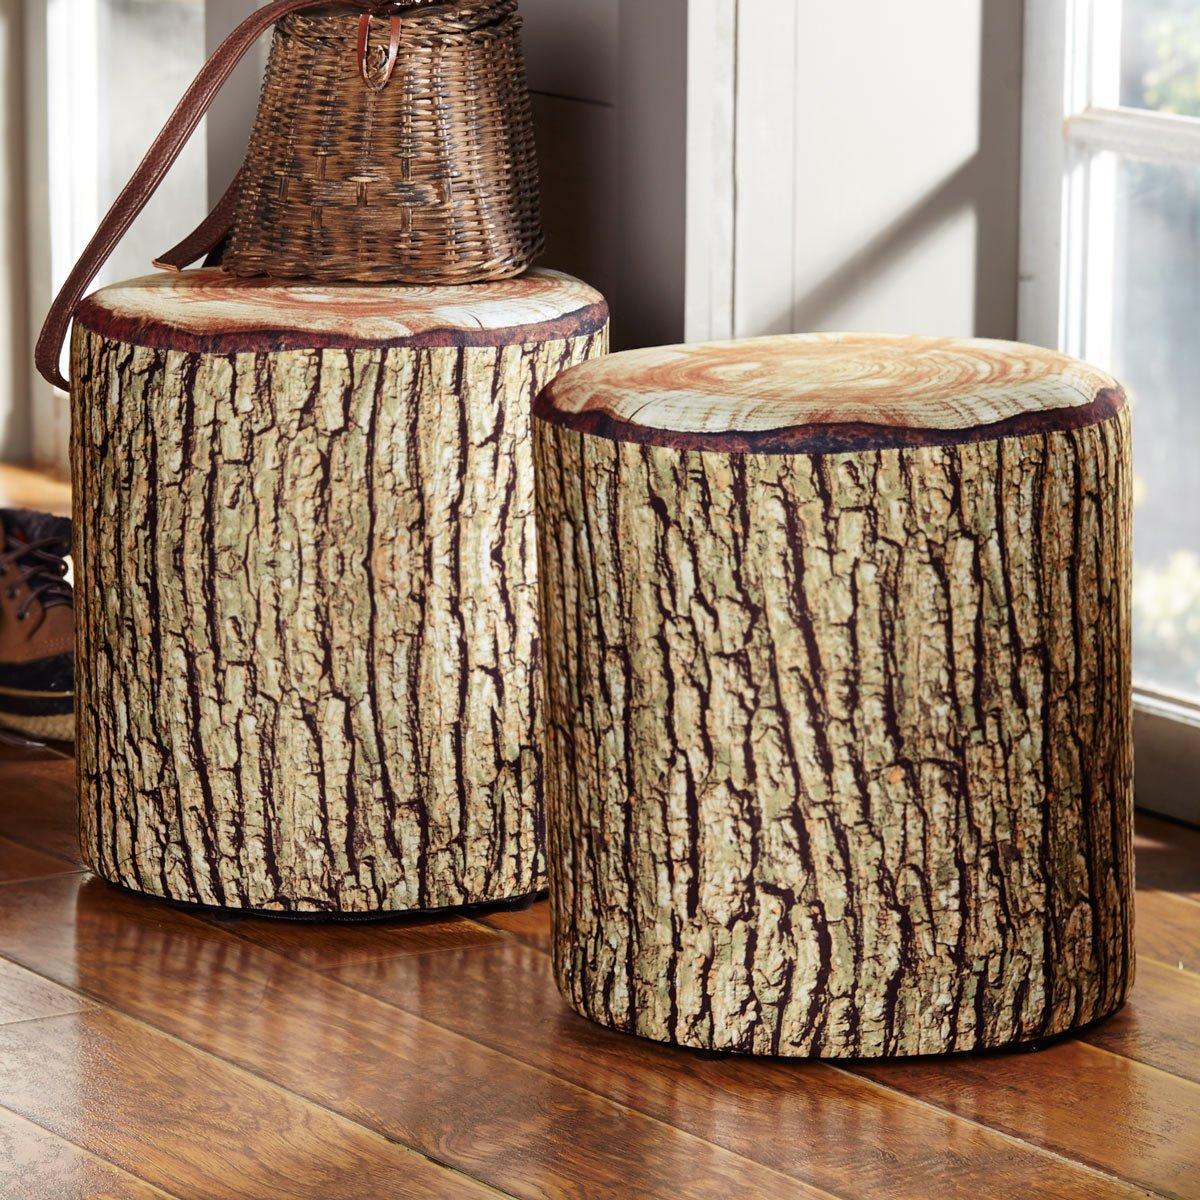 Sensational Black Forest Decor Cushioned Tree Bark Log Seat Machost Co Dining Chair Design Ideas Machostcouk